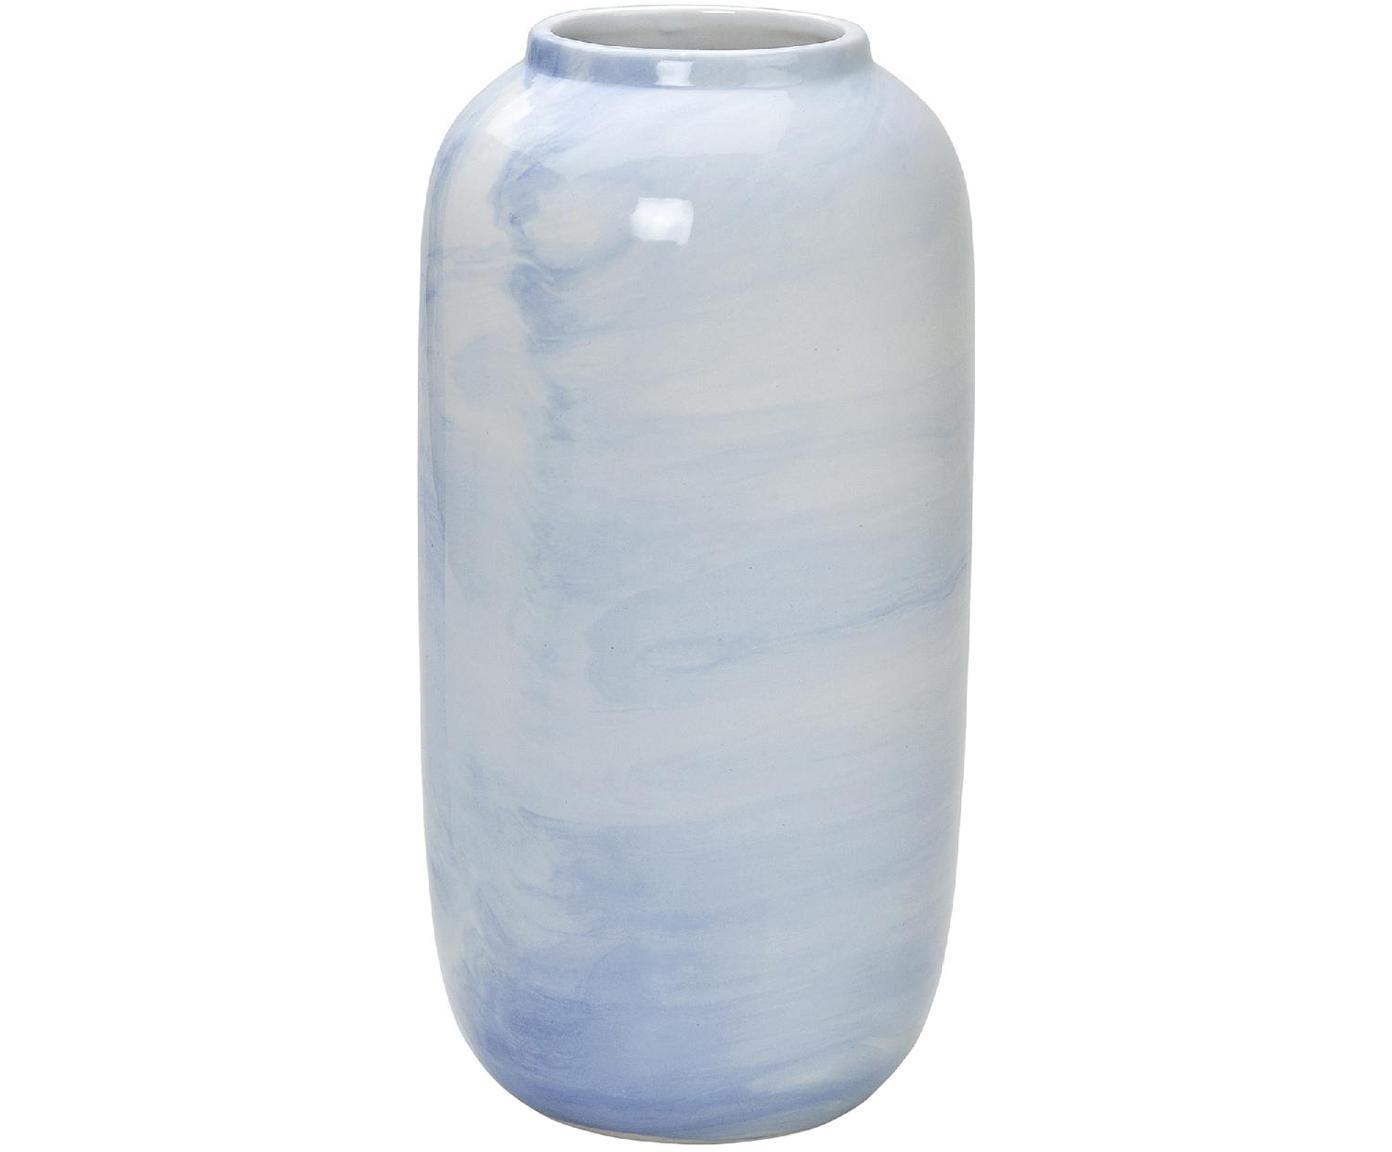 Vase Diluted aus Keramik, Keramik, Hellblau, Ø 13 x H 25 cm